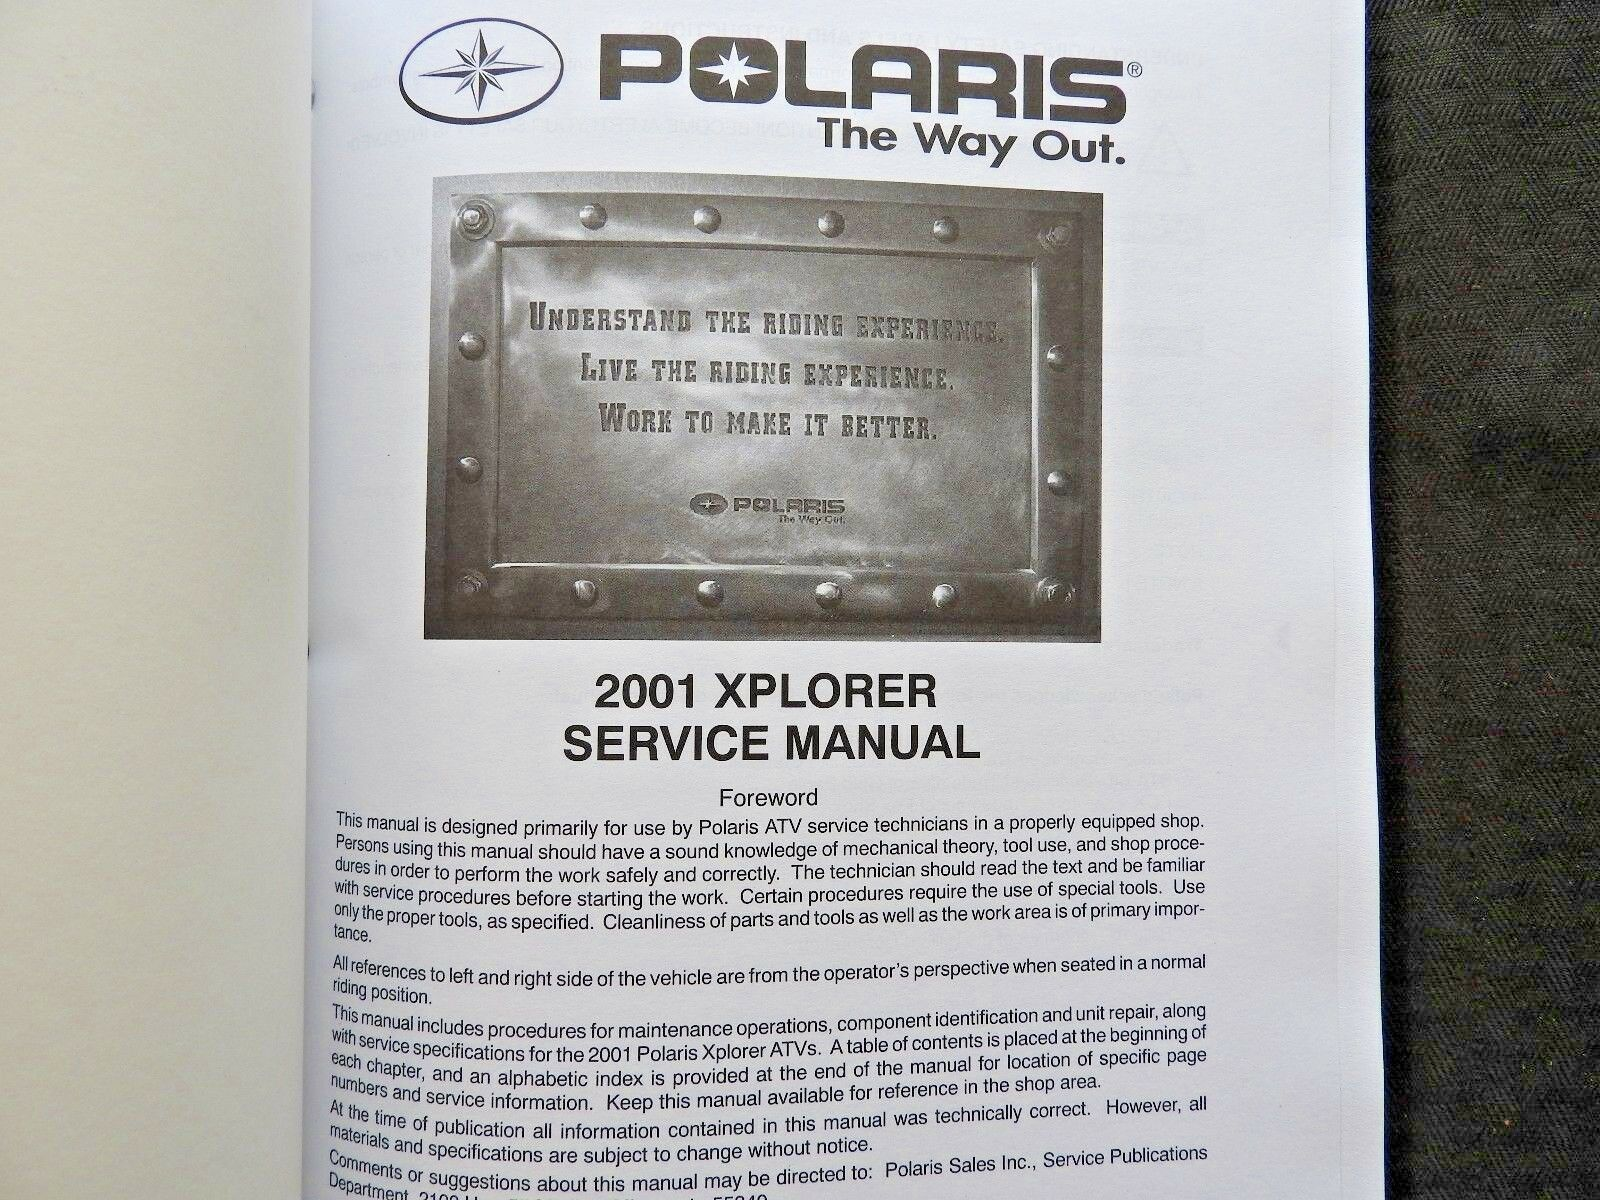 2001 Polaris Atv Xplorer 400 4x4 Service Repair Manual Ebay 300 Wiring Diagram